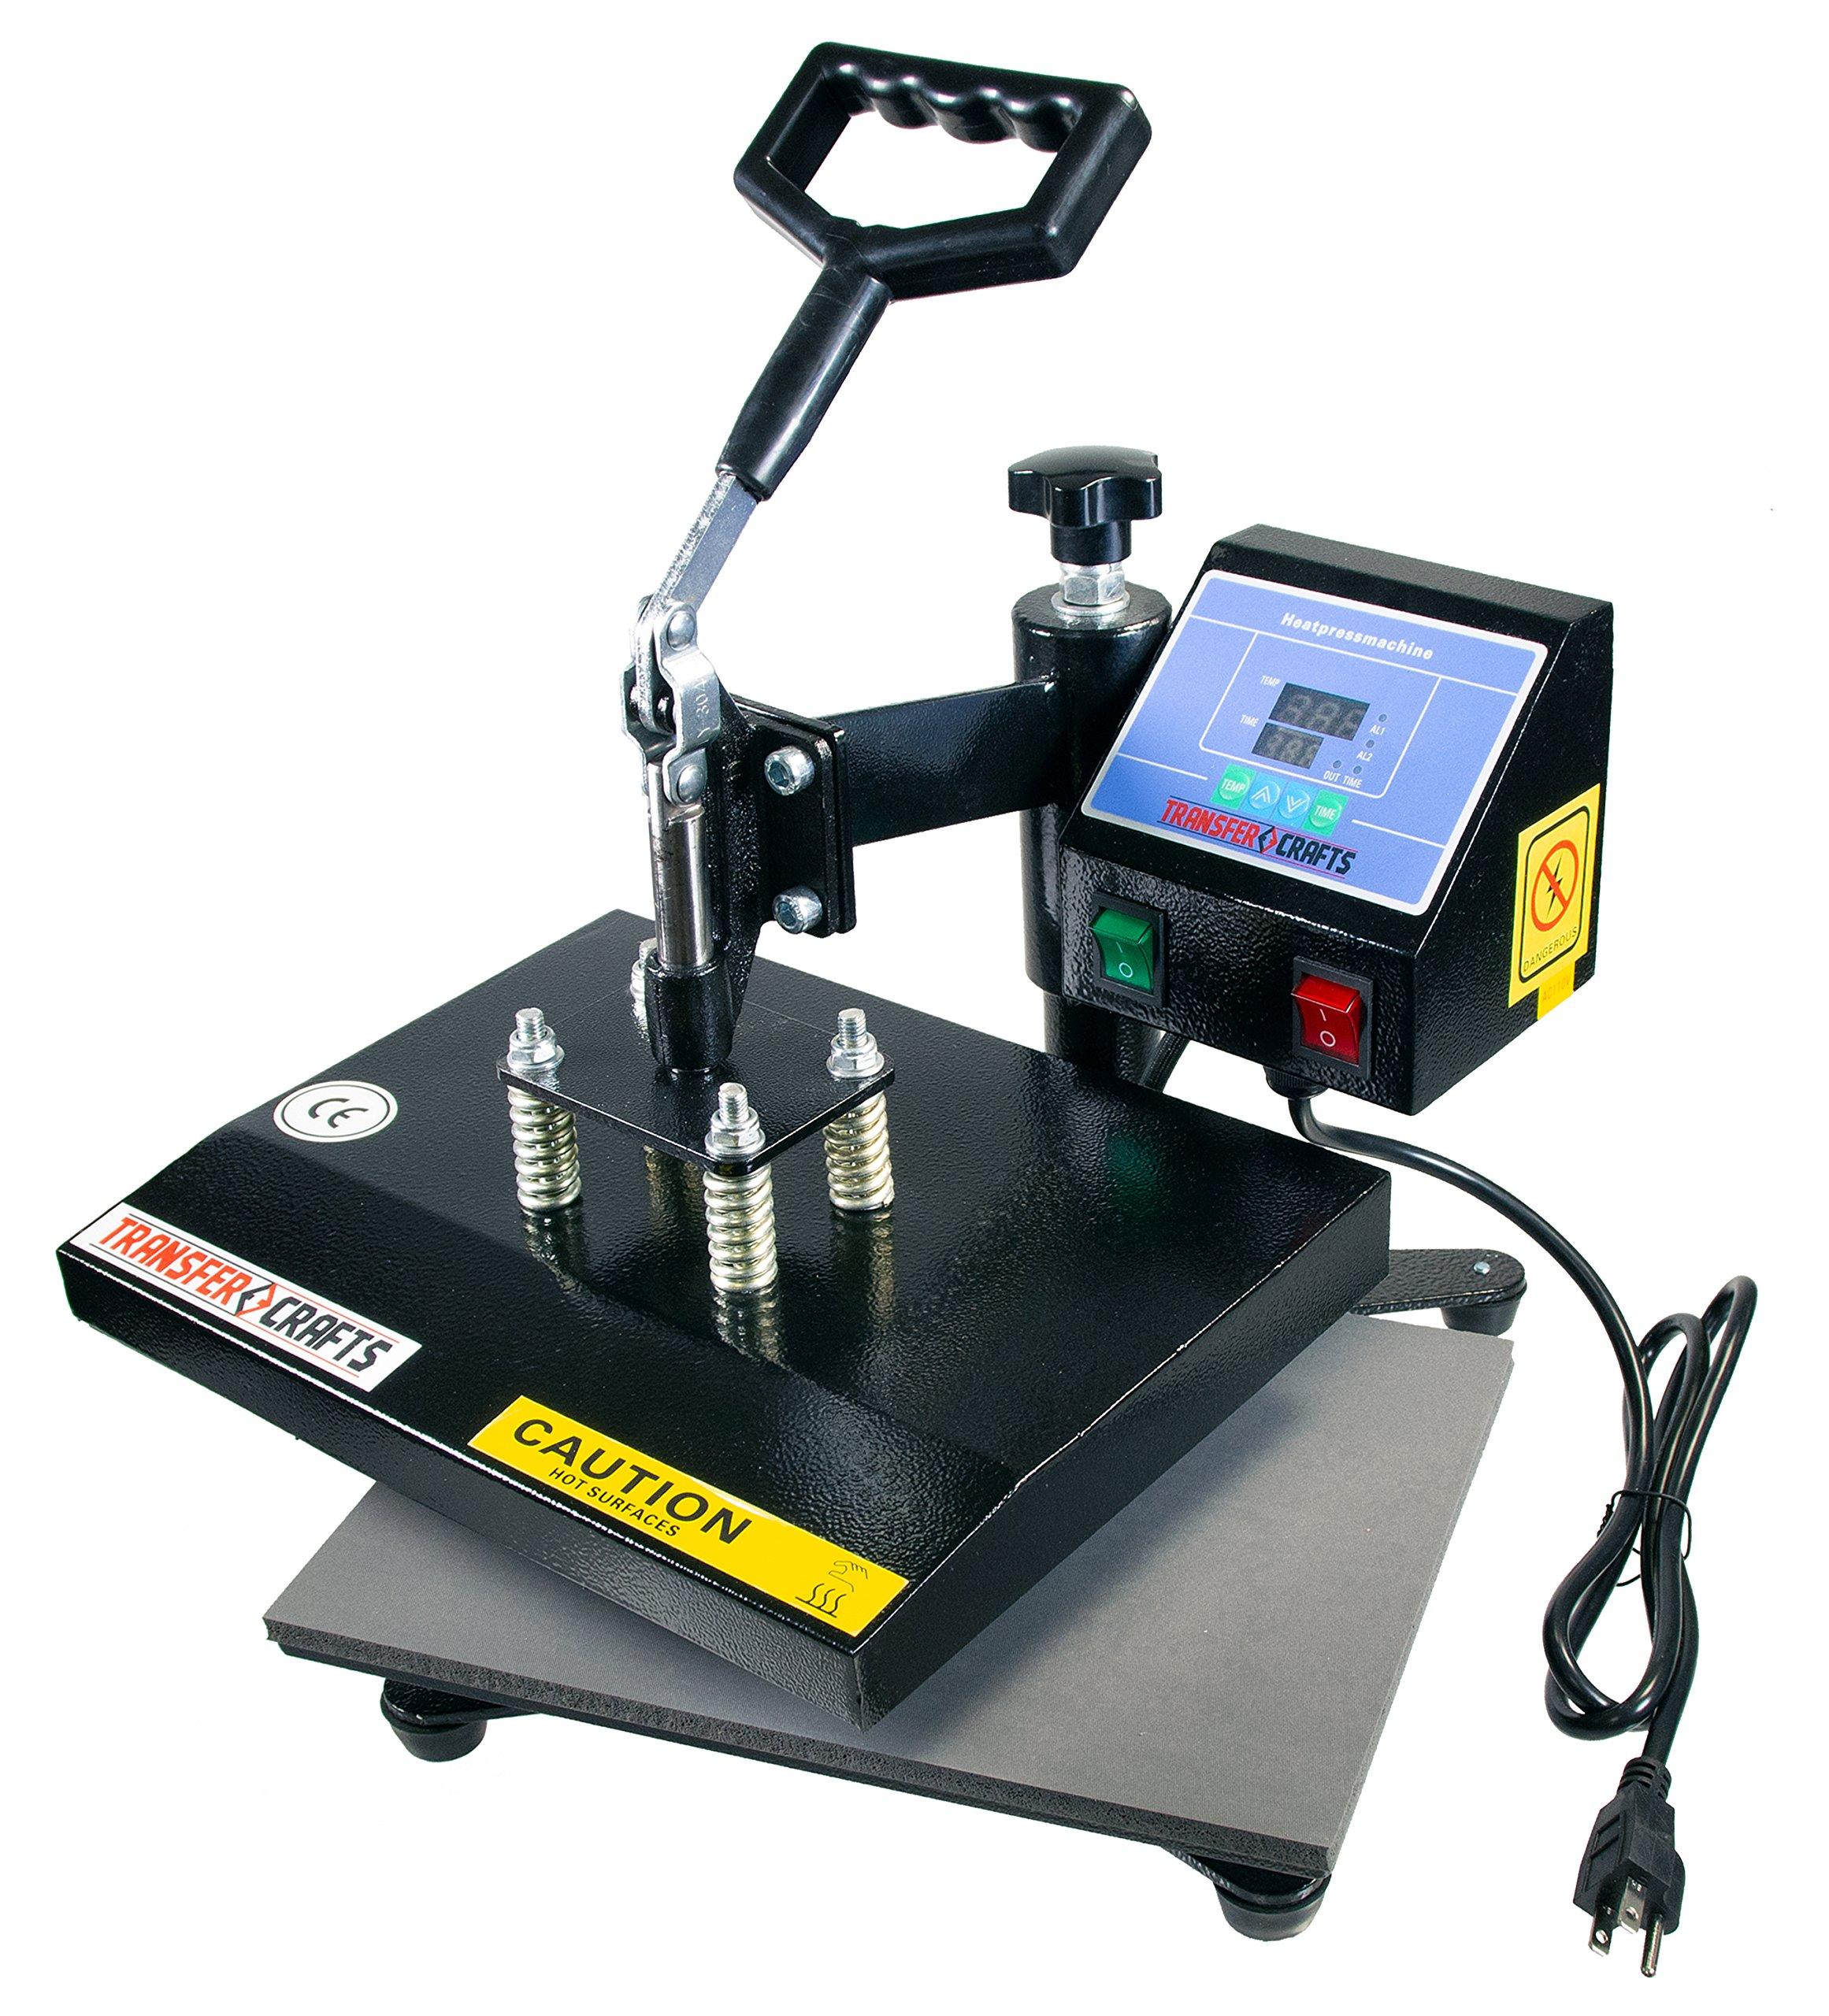 Transfer Crafts T-Shirt Heat Press & Digital Sublimation Machine (9 x 12) by Transfer Crafts